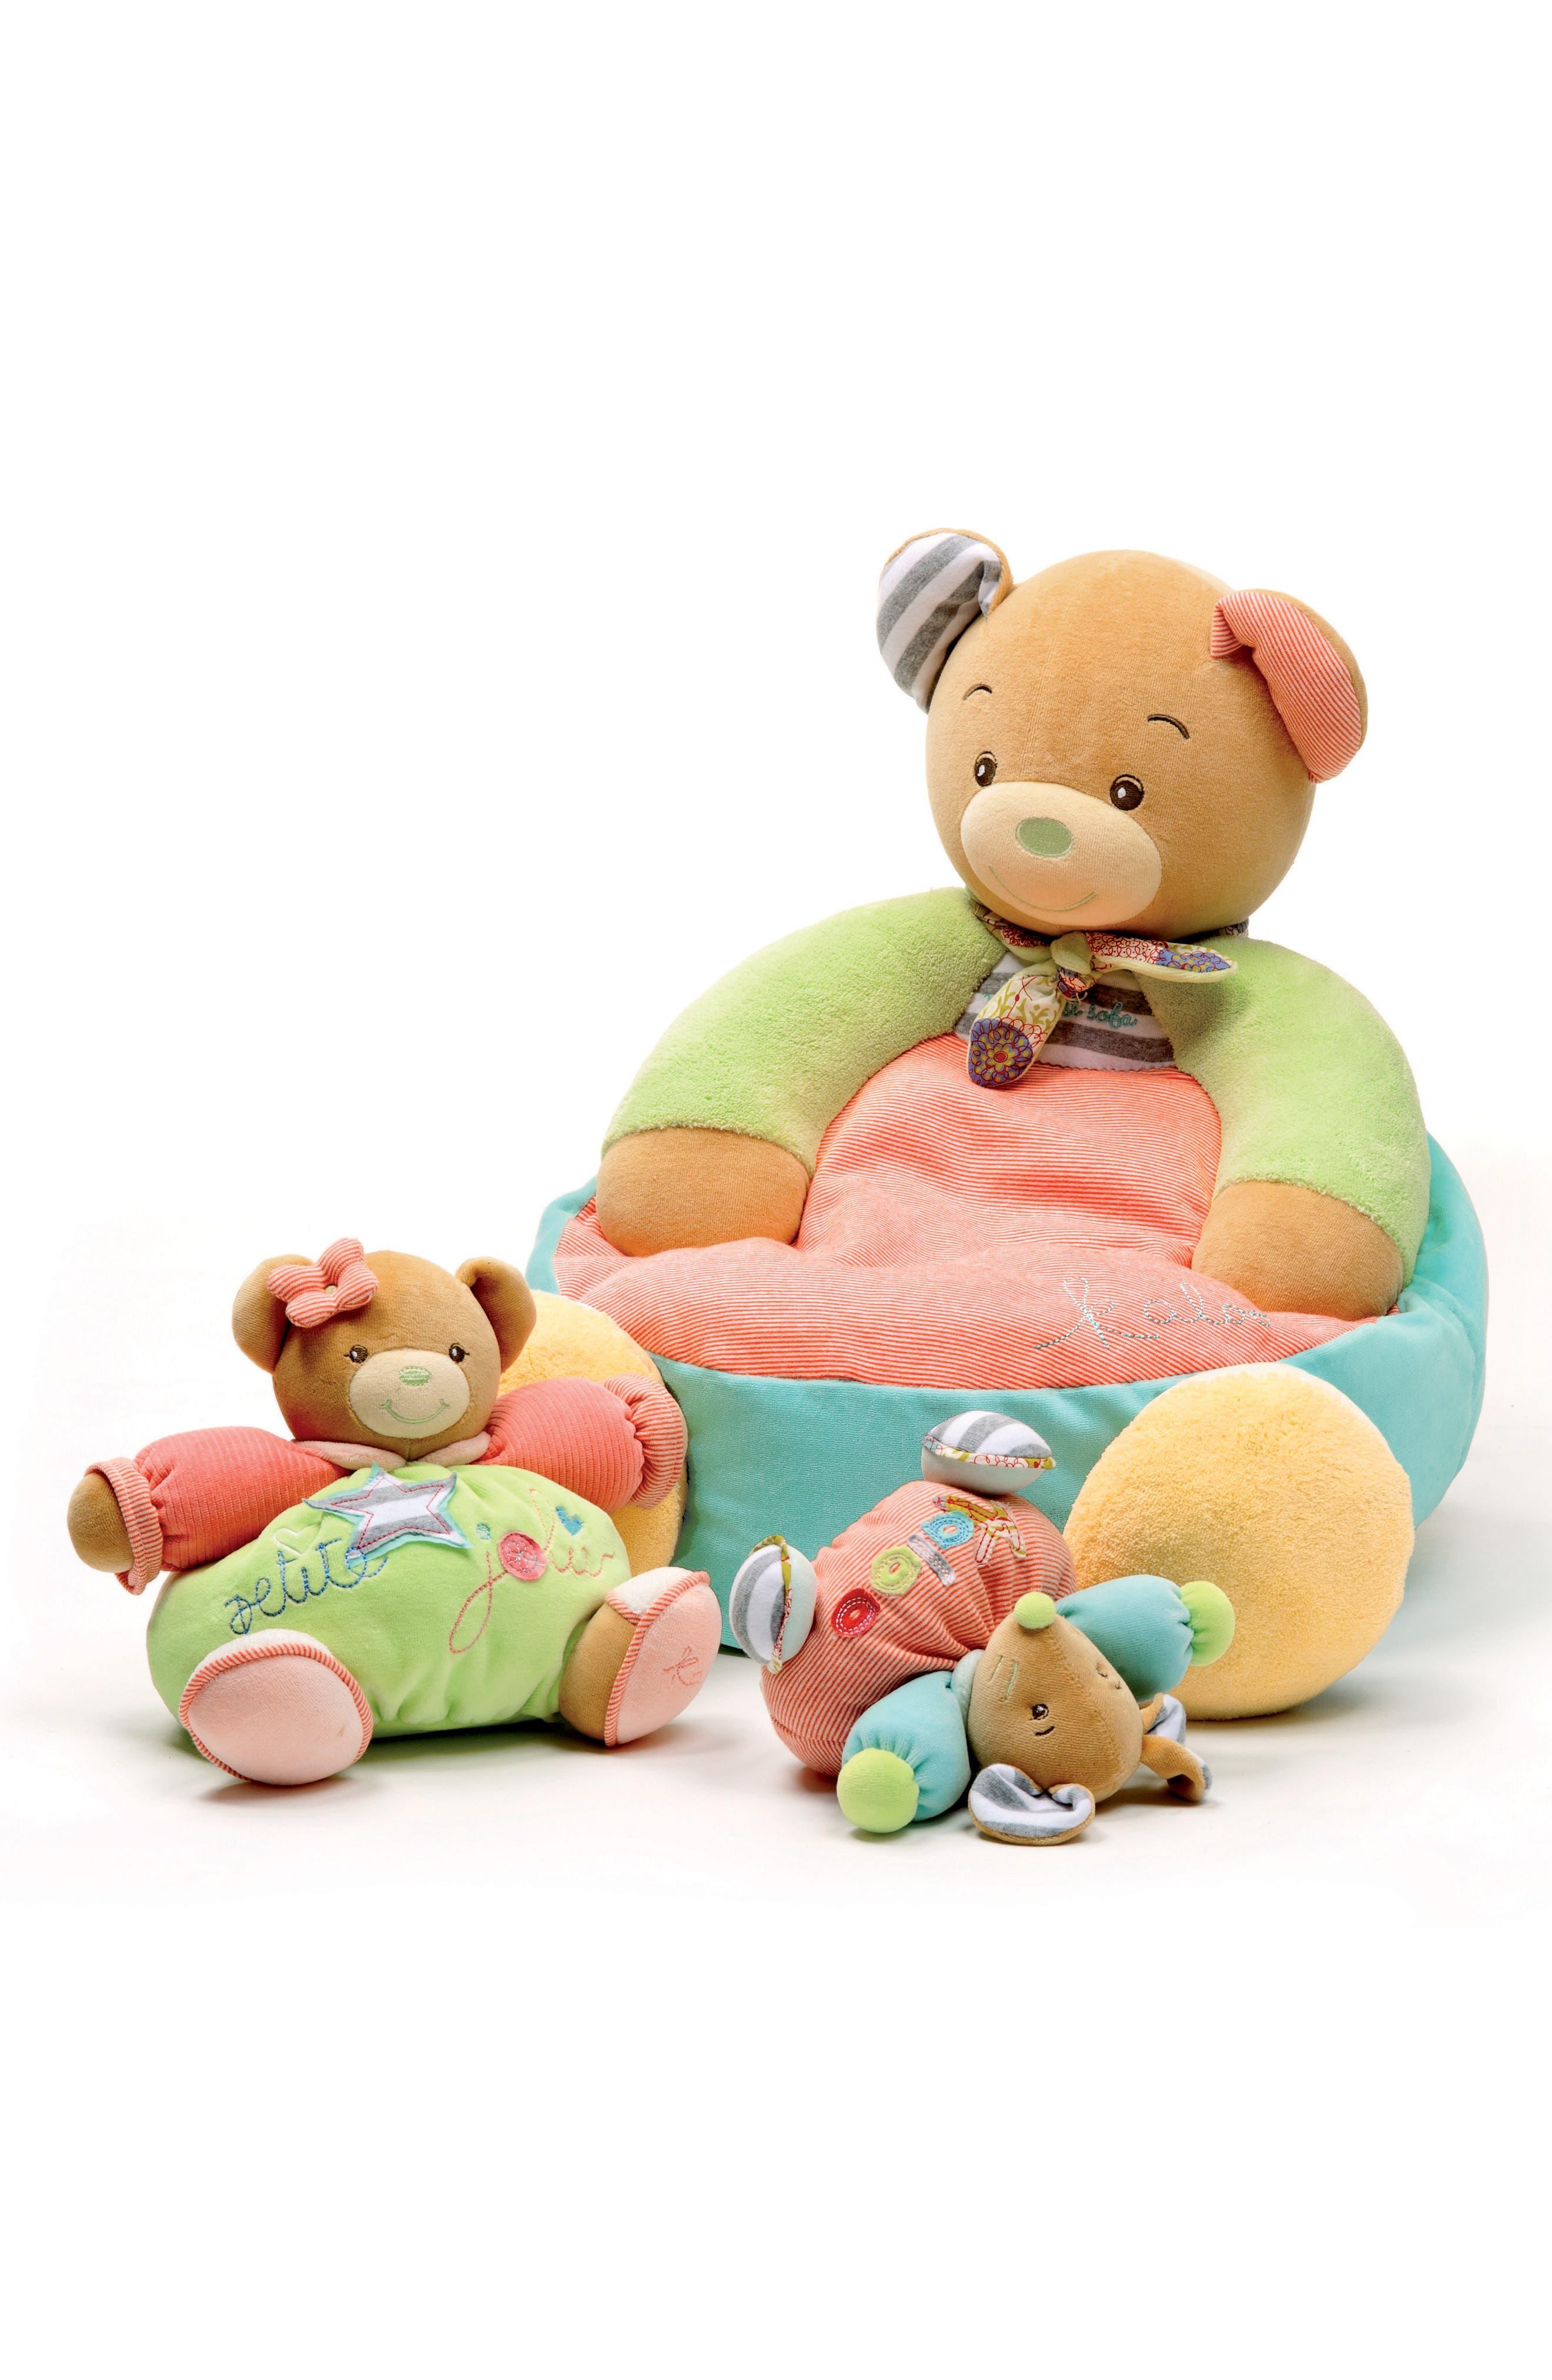 Main Image - Kaloo Bliss Bear Stuffed Animal